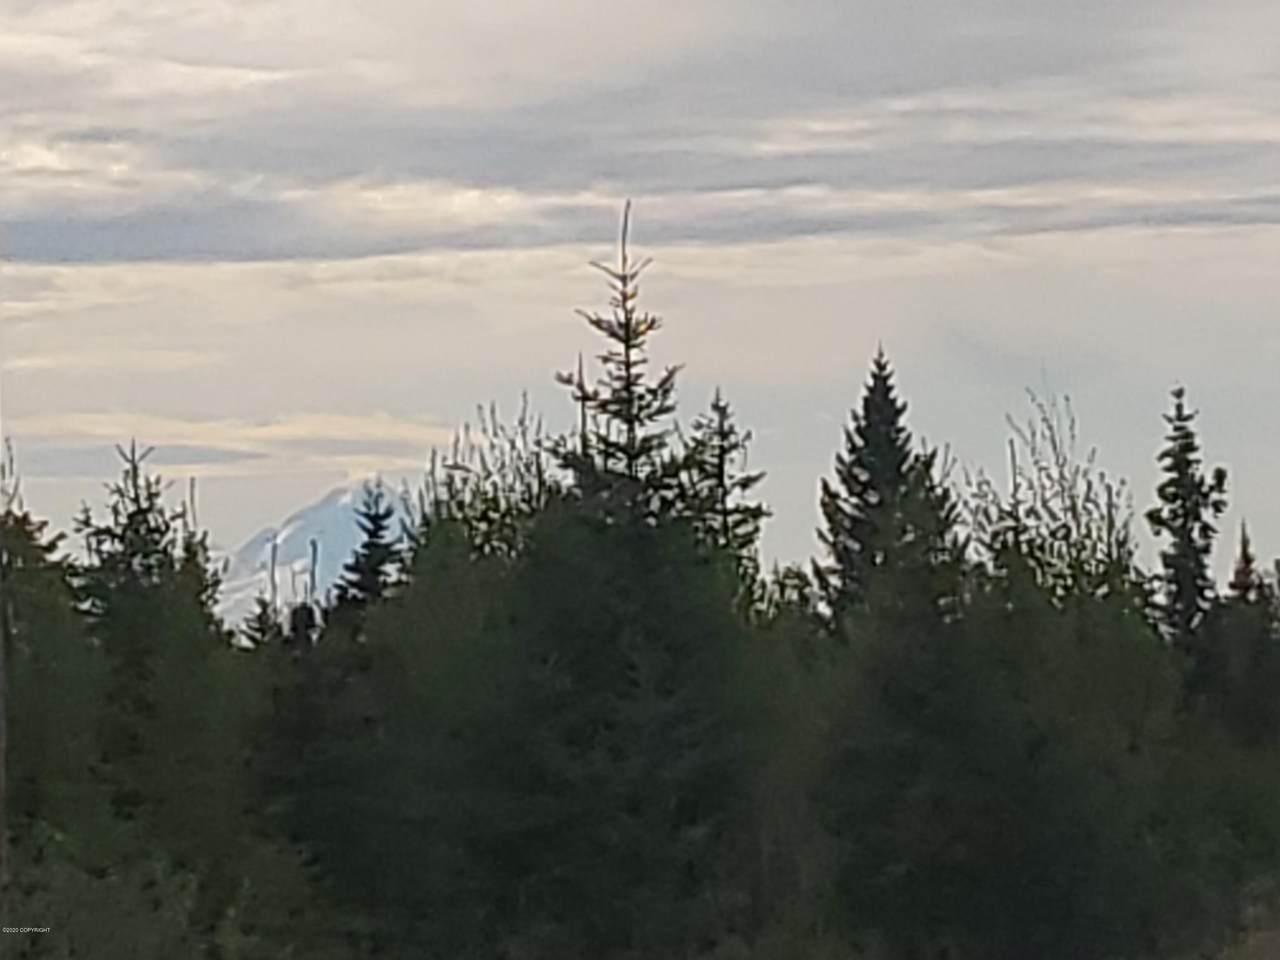 https://bt-photos.global.ssl.fastly.net/alaska/1280_boomver_1_20-8057-2.jpg